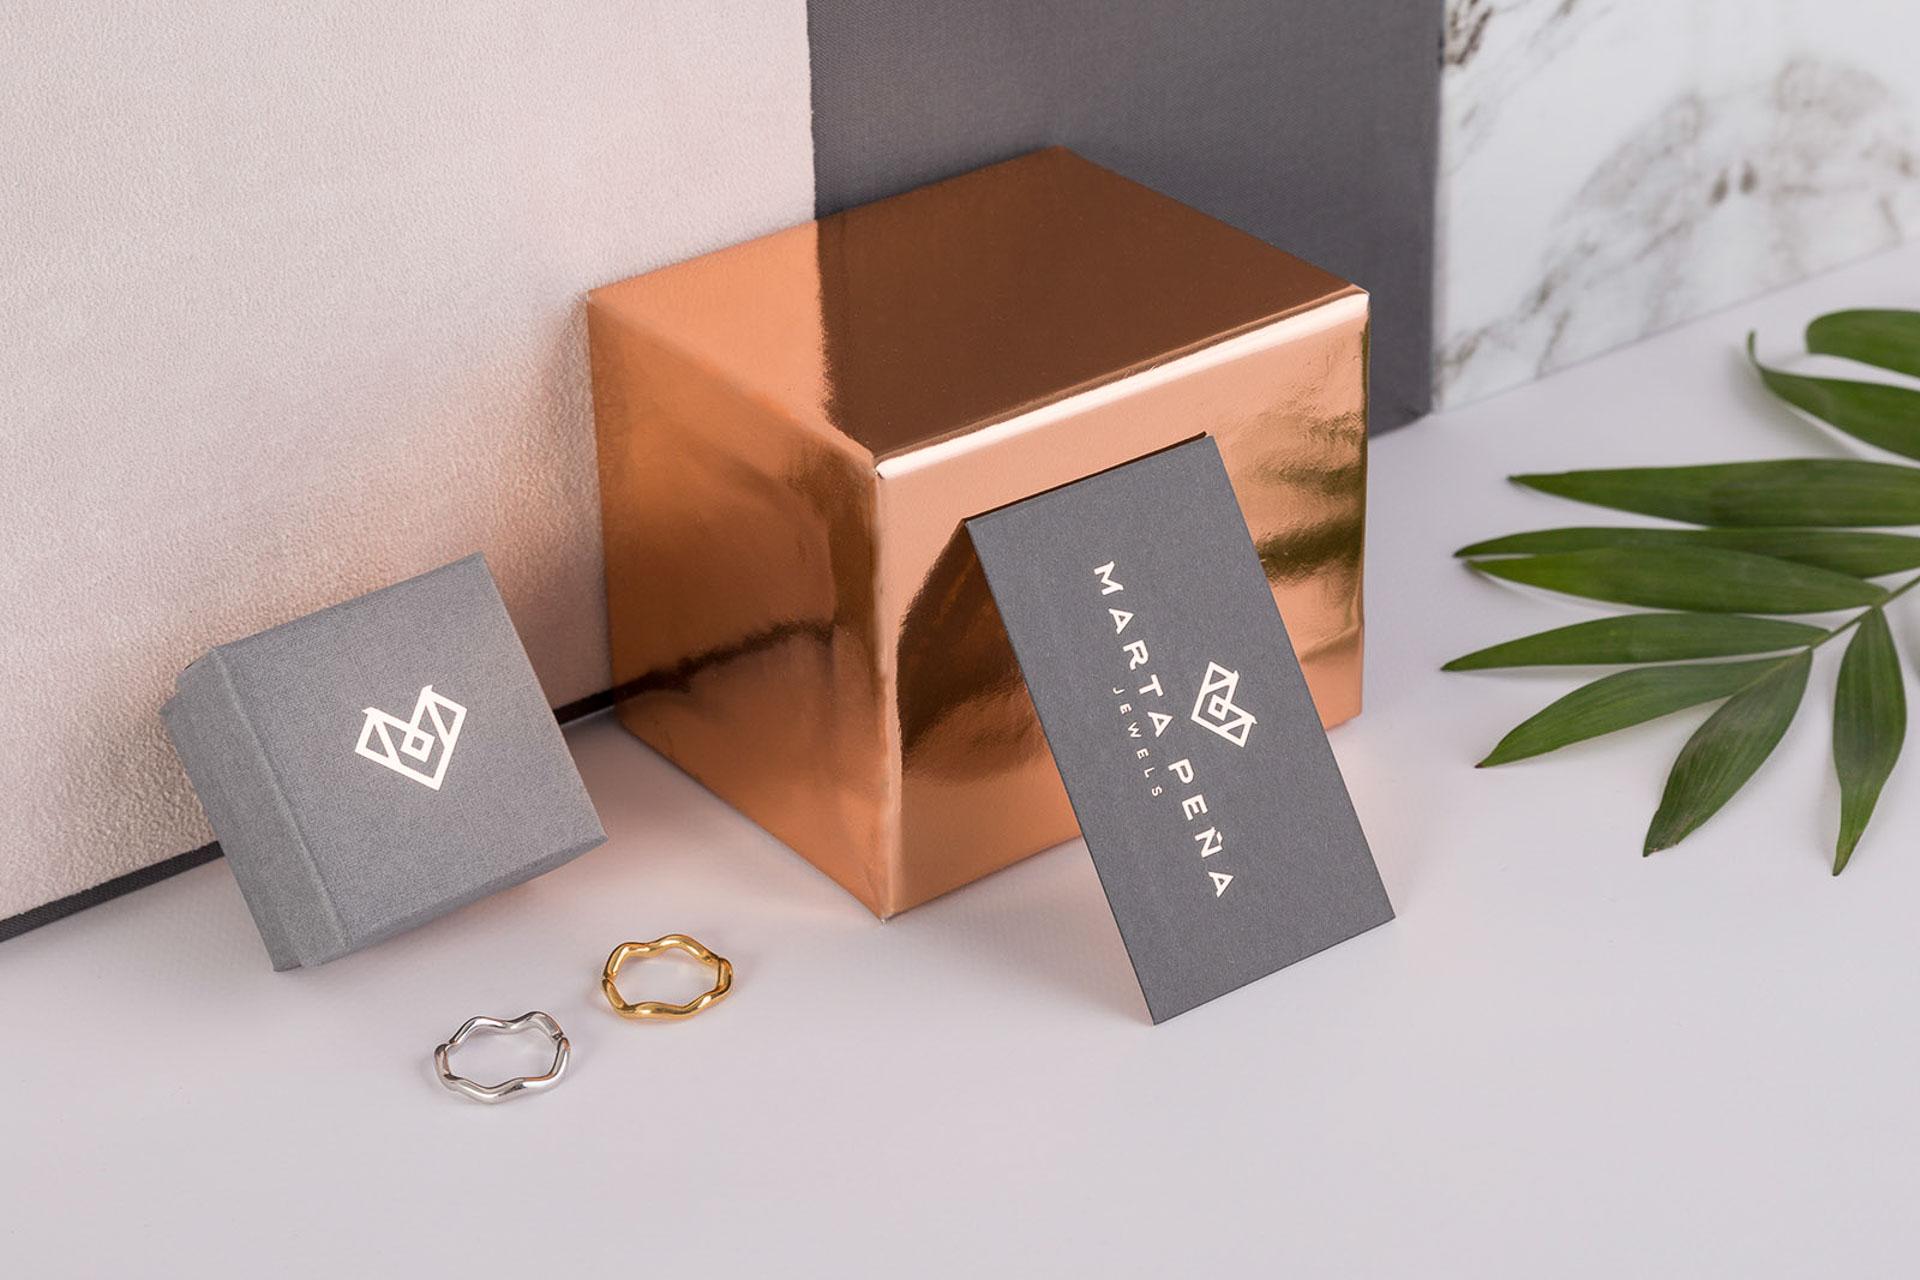 Fotografia de Producto Papeleria diseño Tarjeta y Caja